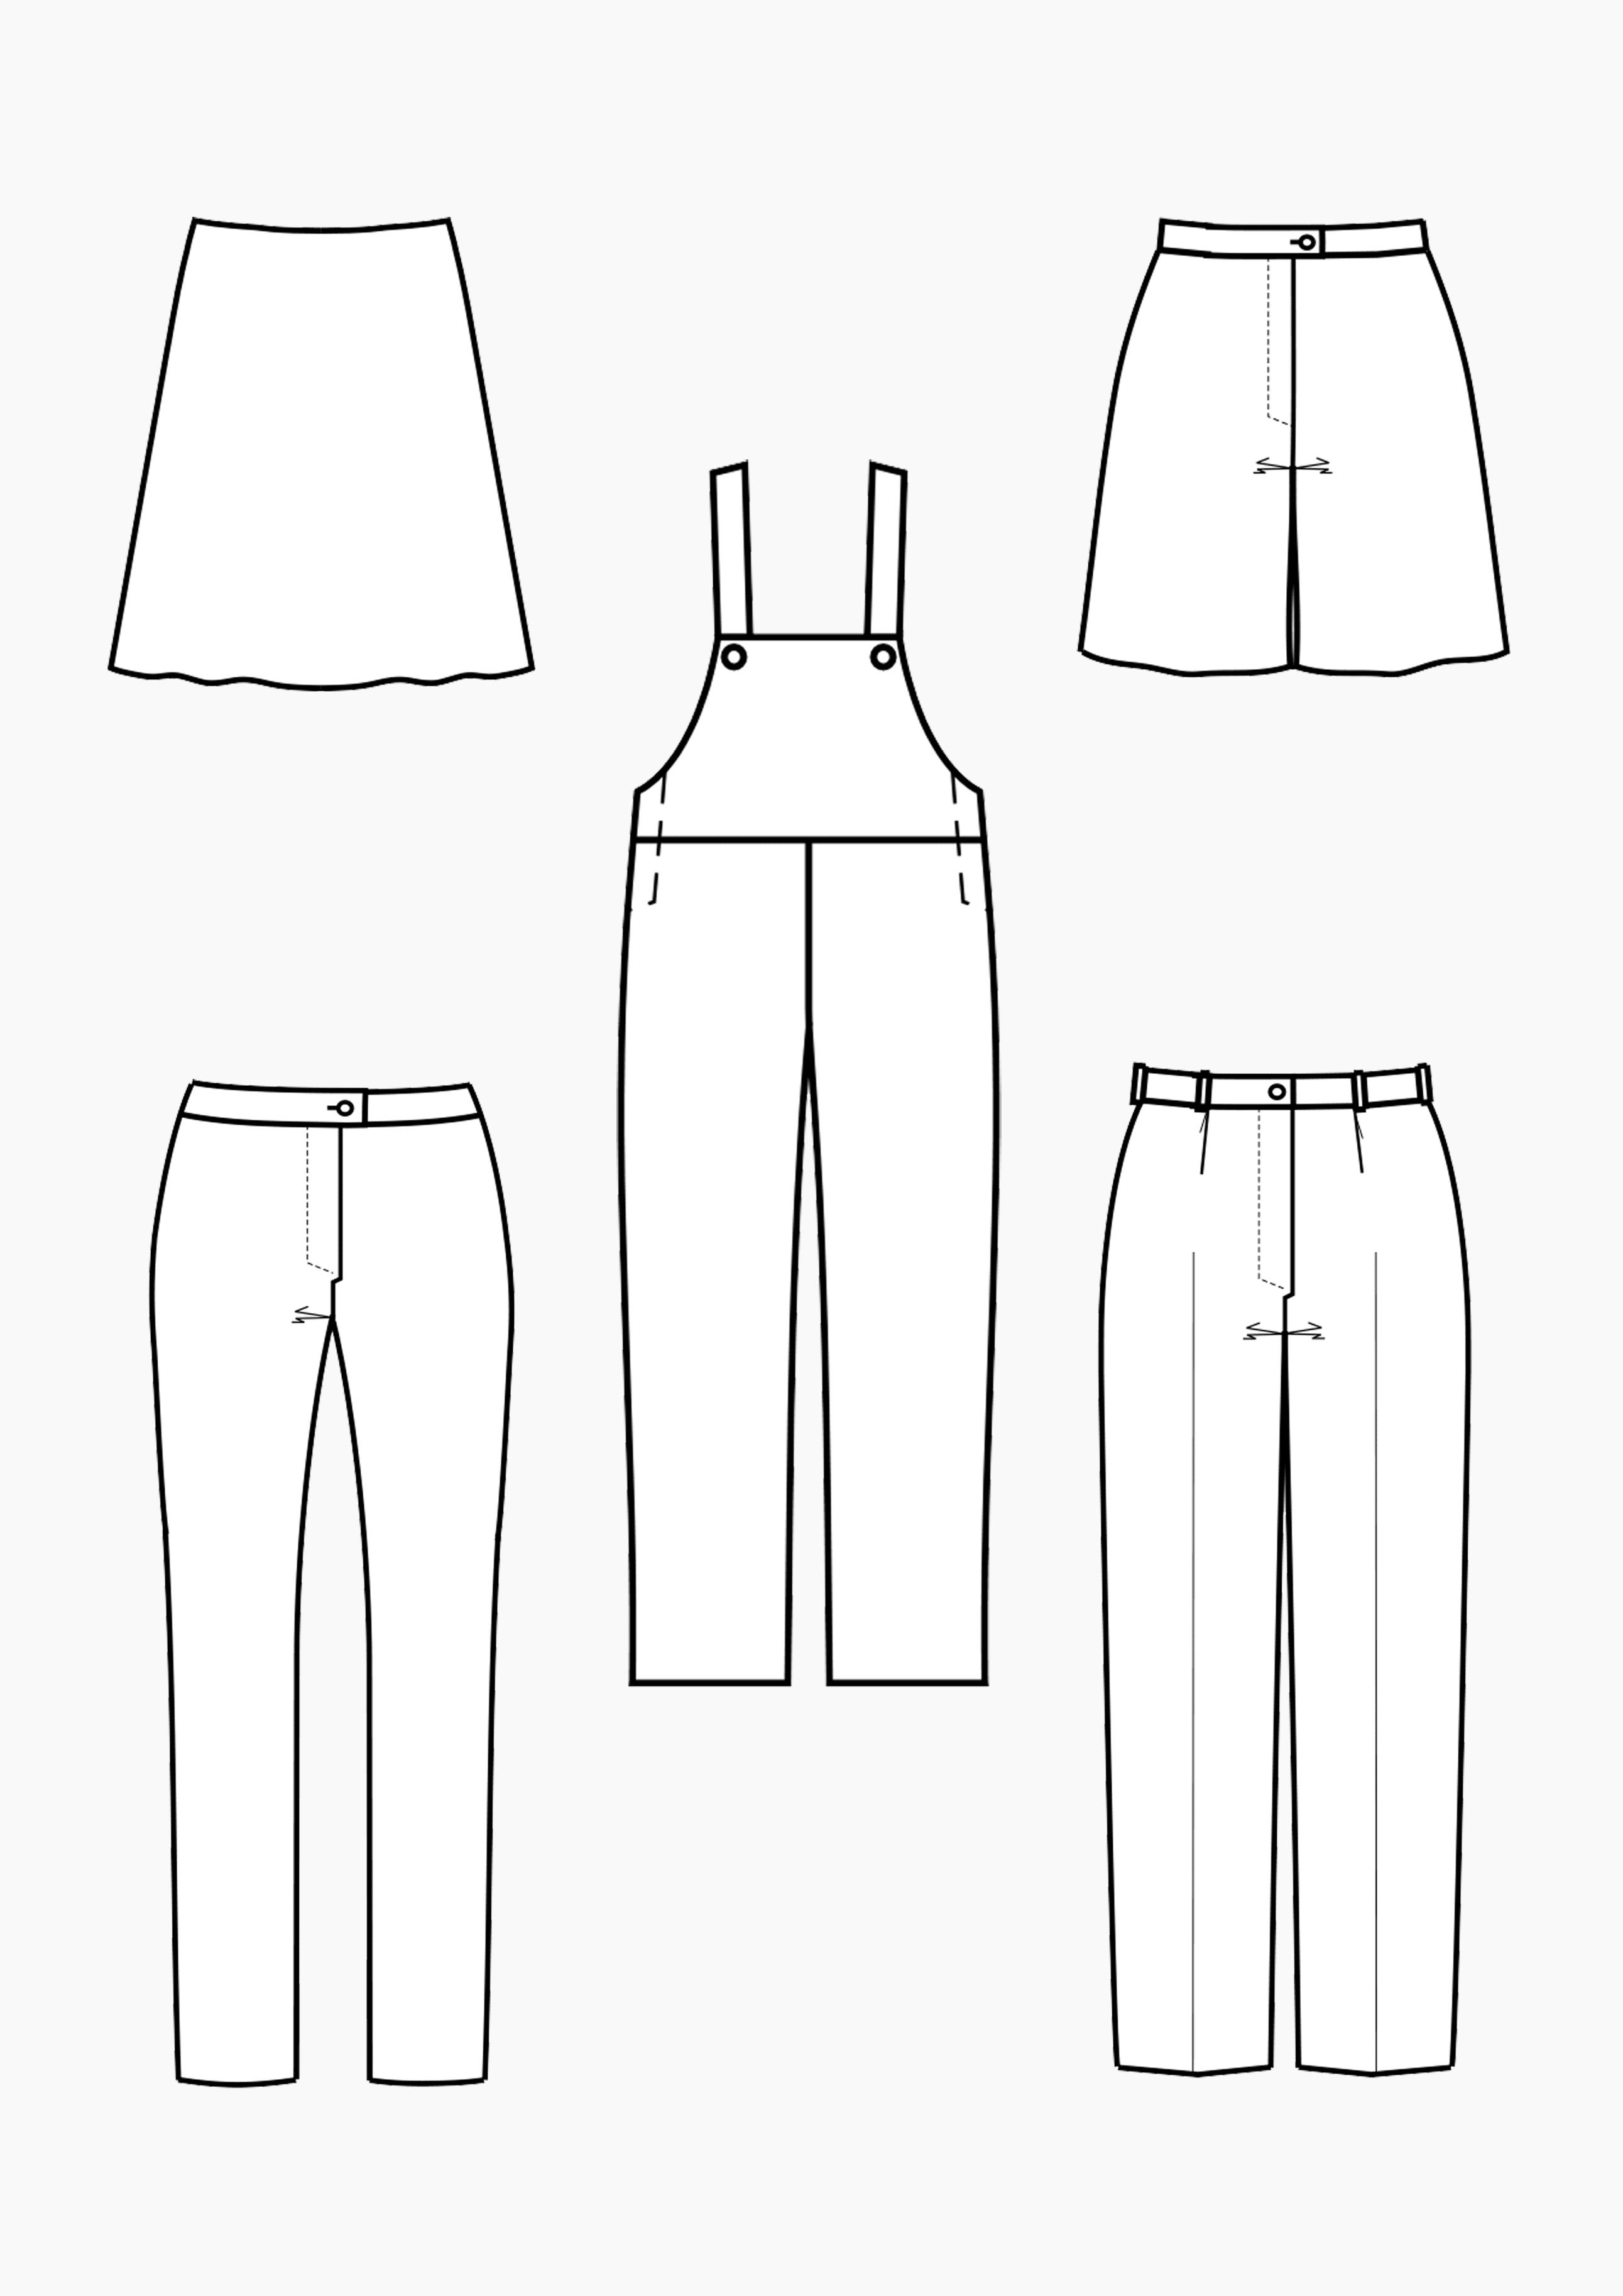 Produkt: Schnitt-Technik Grundschnitt-Konstruktionen Röcke & Hosen für Mädchen